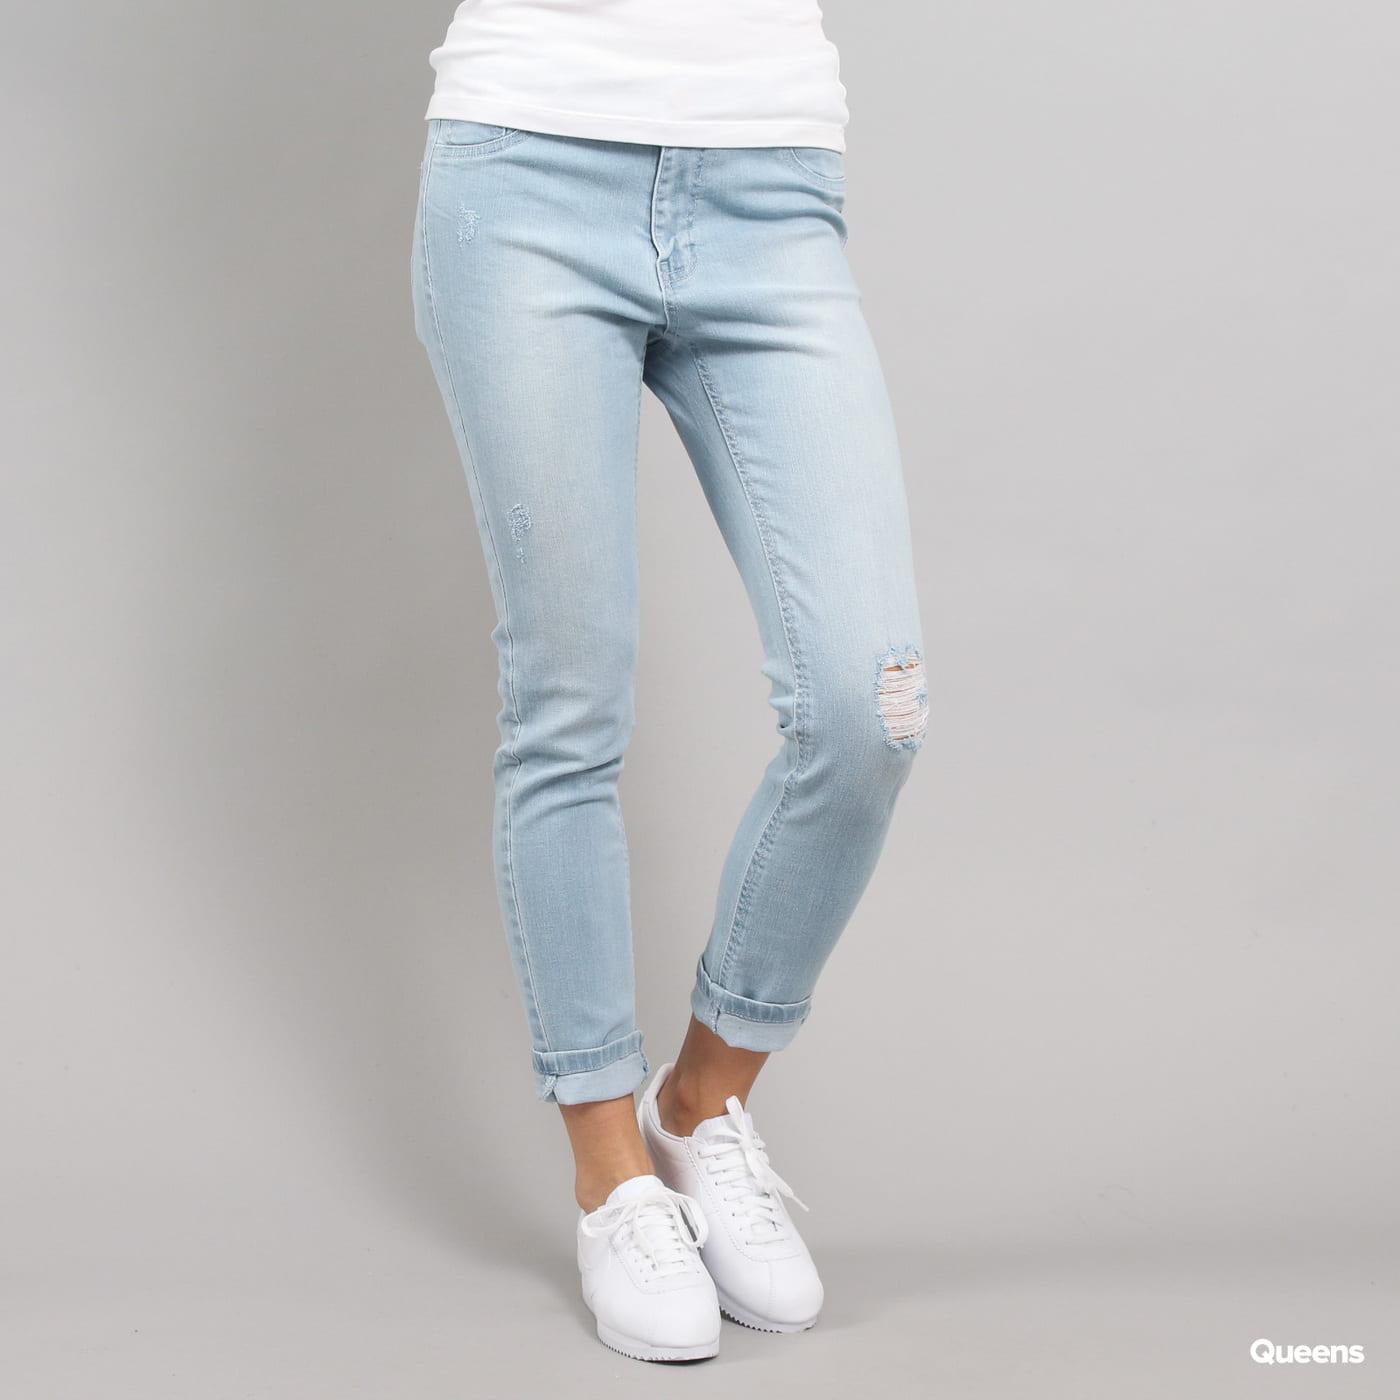 Urban Classics Ladies High Waist Skinny Denim Pants light blue